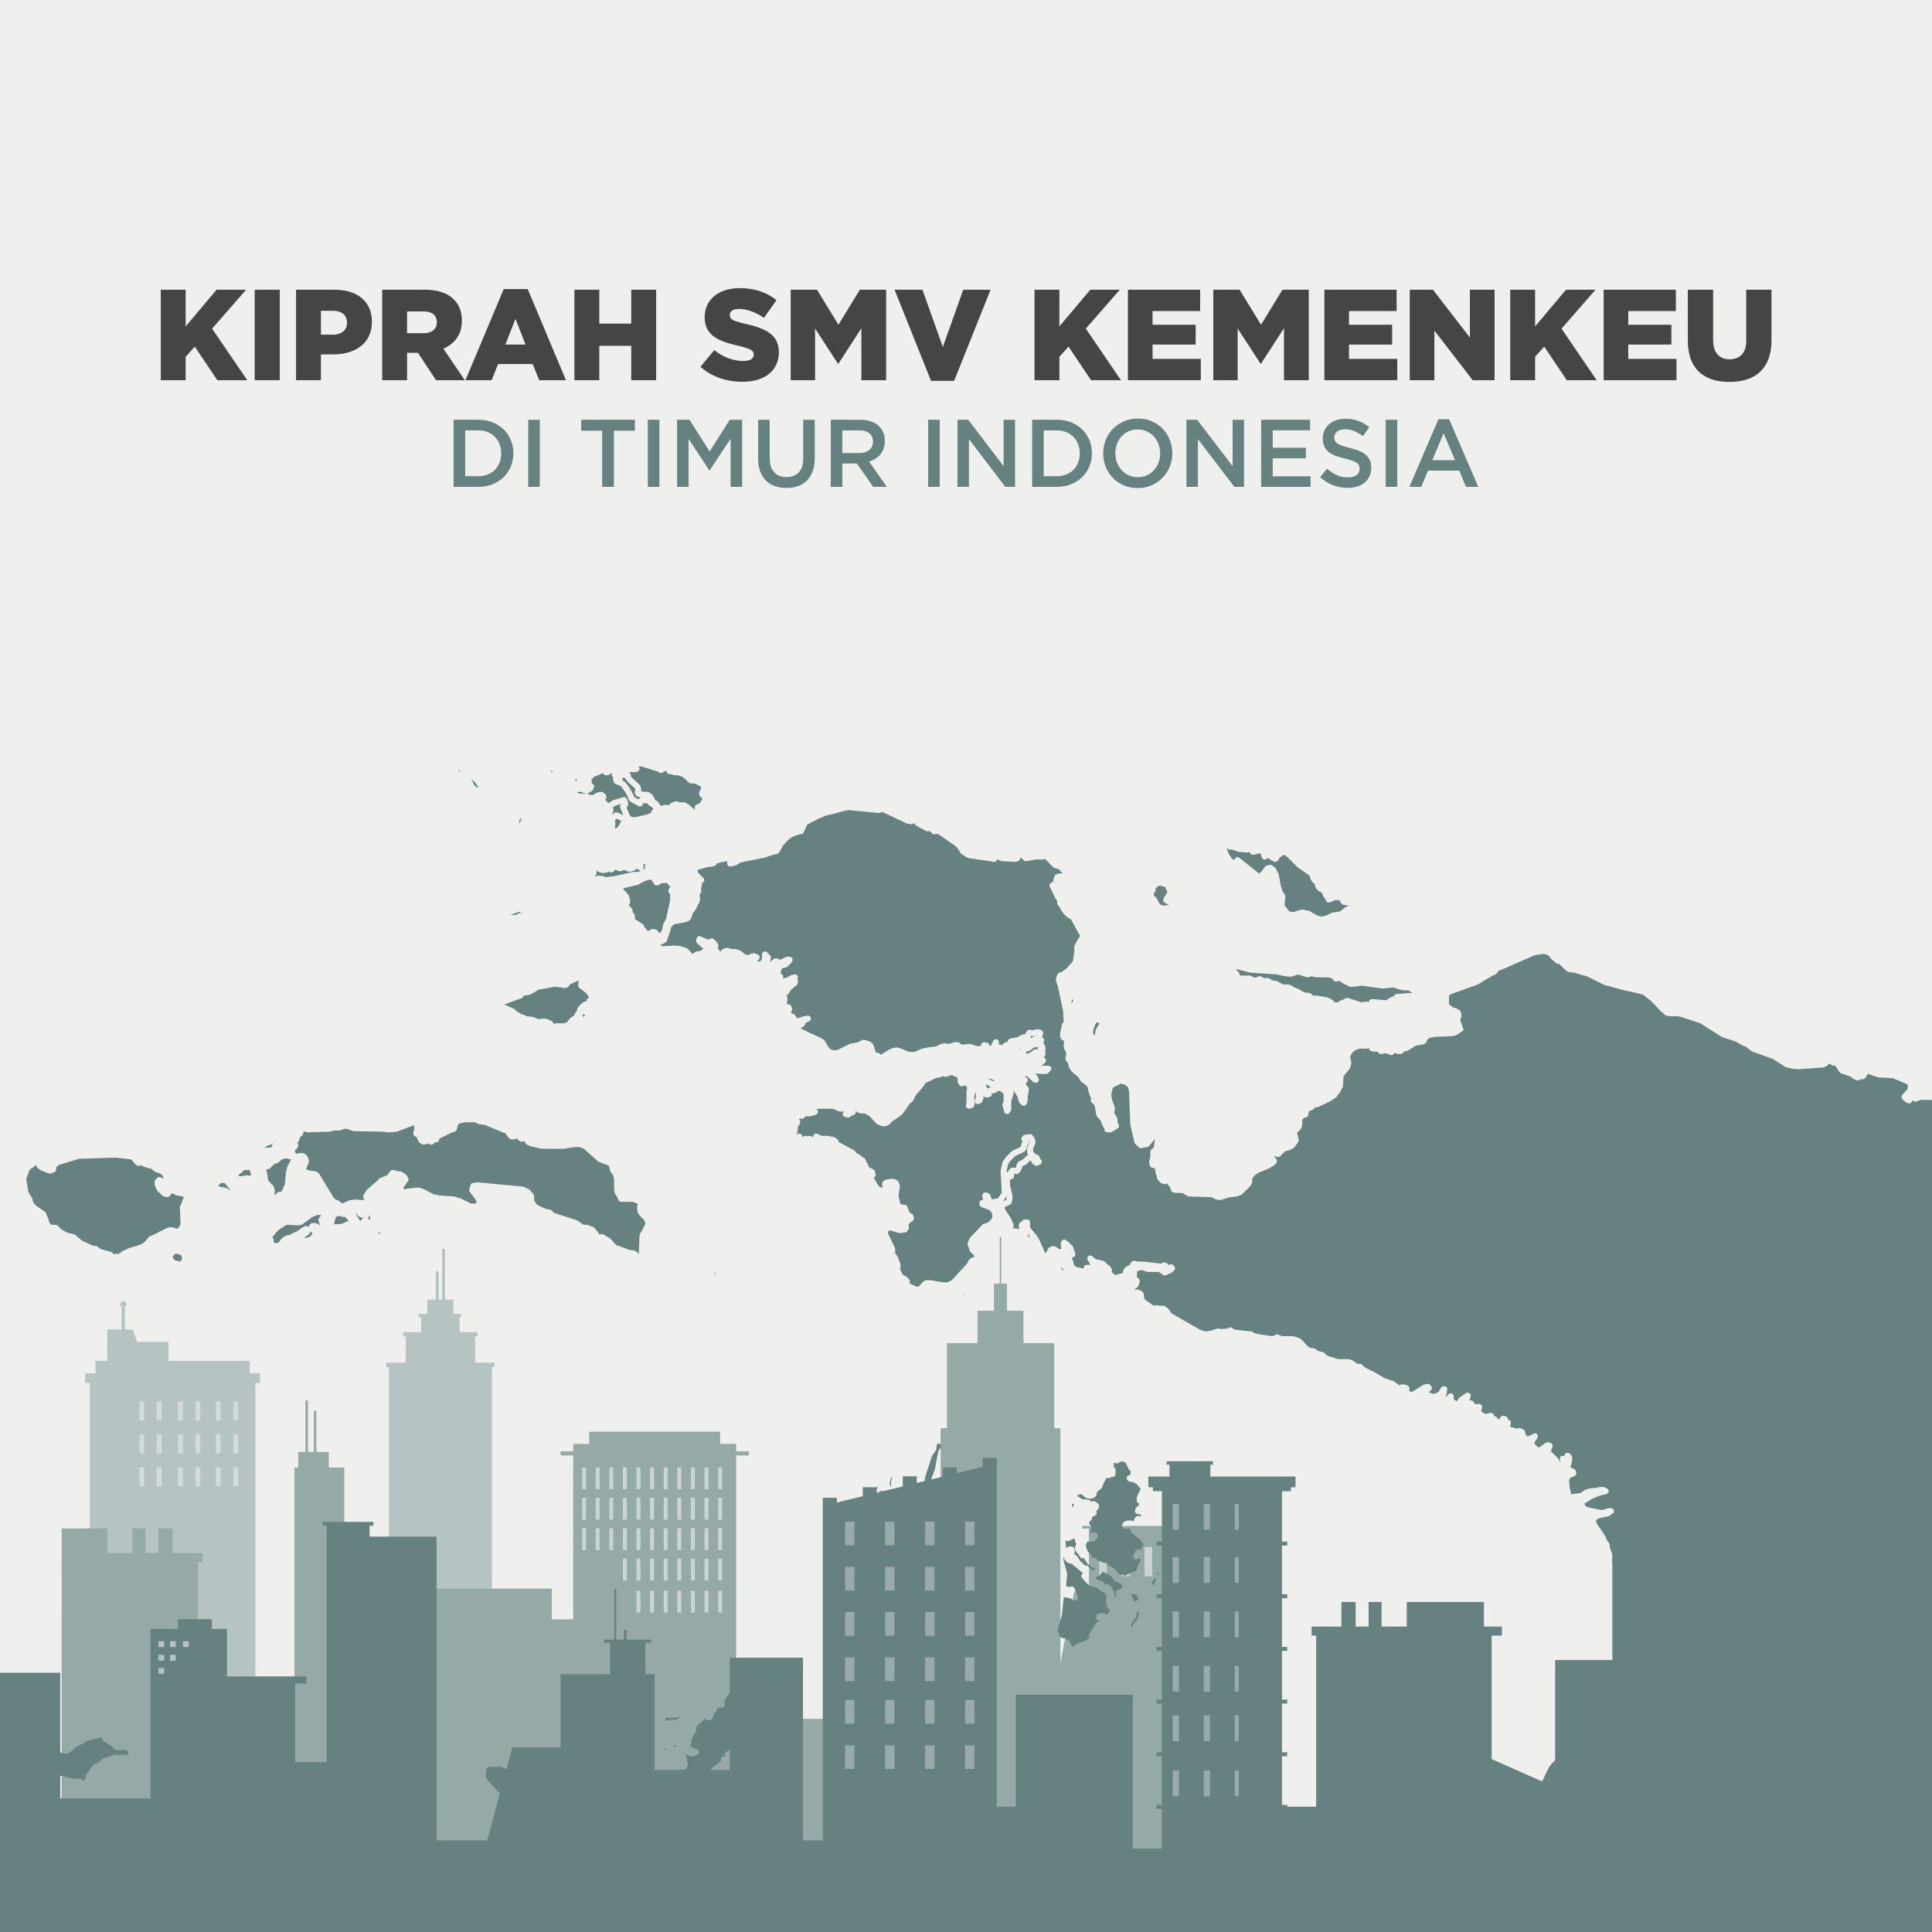 Kiprah SMV (Special Mission Vehicle) Kemenkeu di Timur Indonesia